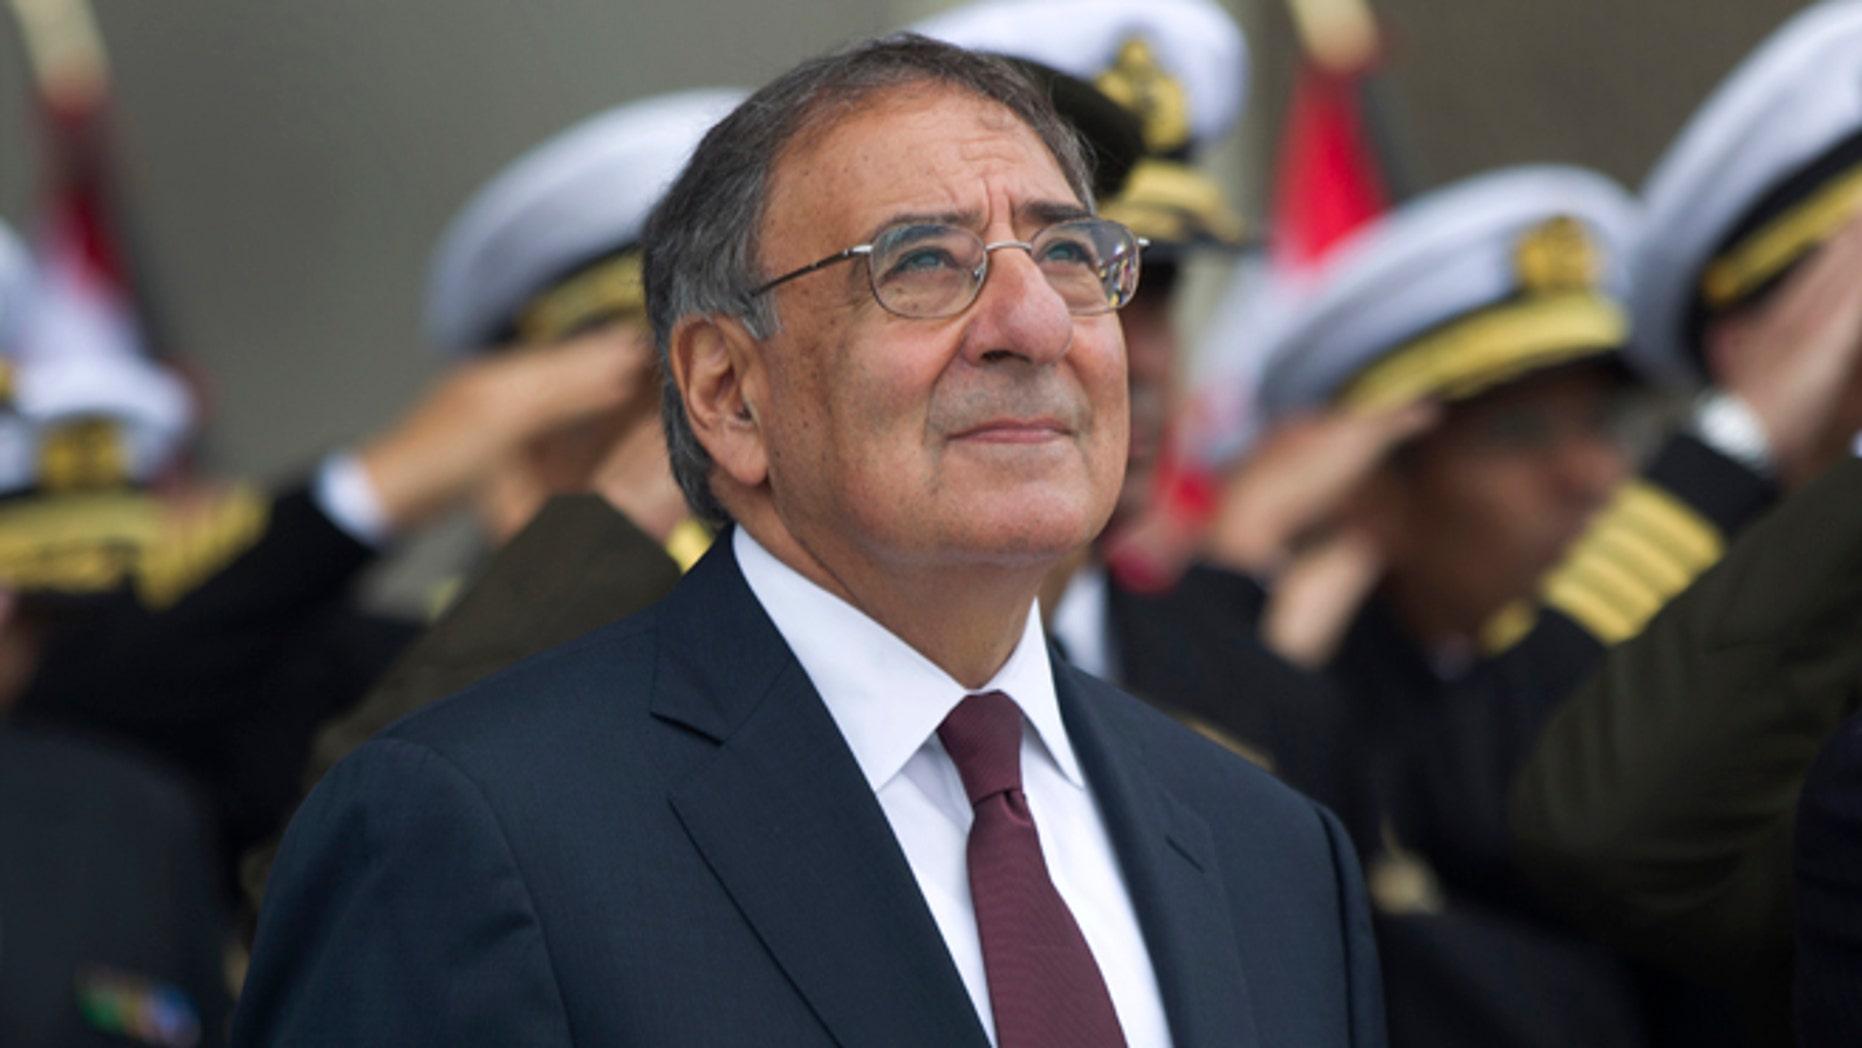 Oct. 6, 2012: U.S. Defense Secretary Leon Panetta attends a ceremony at army headquarters in Lima, Peru.